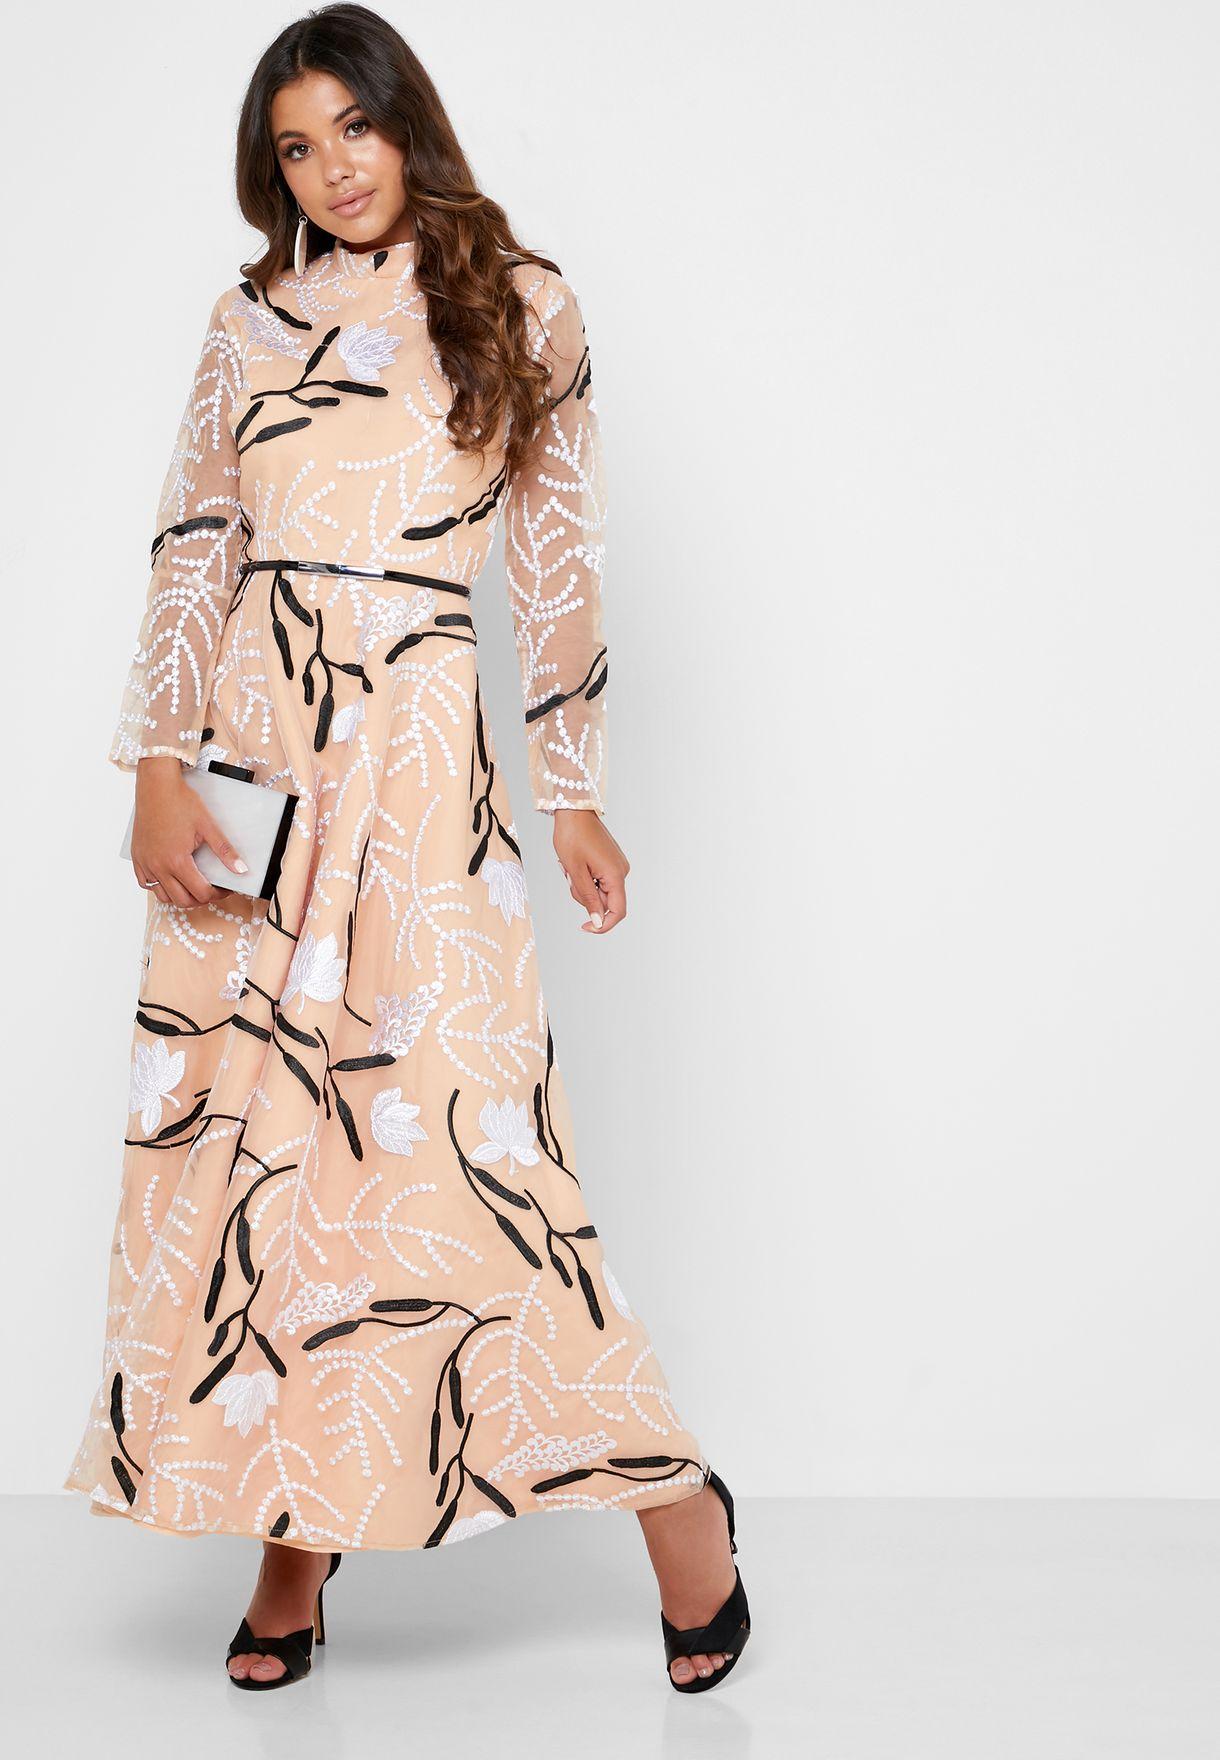 فستان اورجانزا مطرز